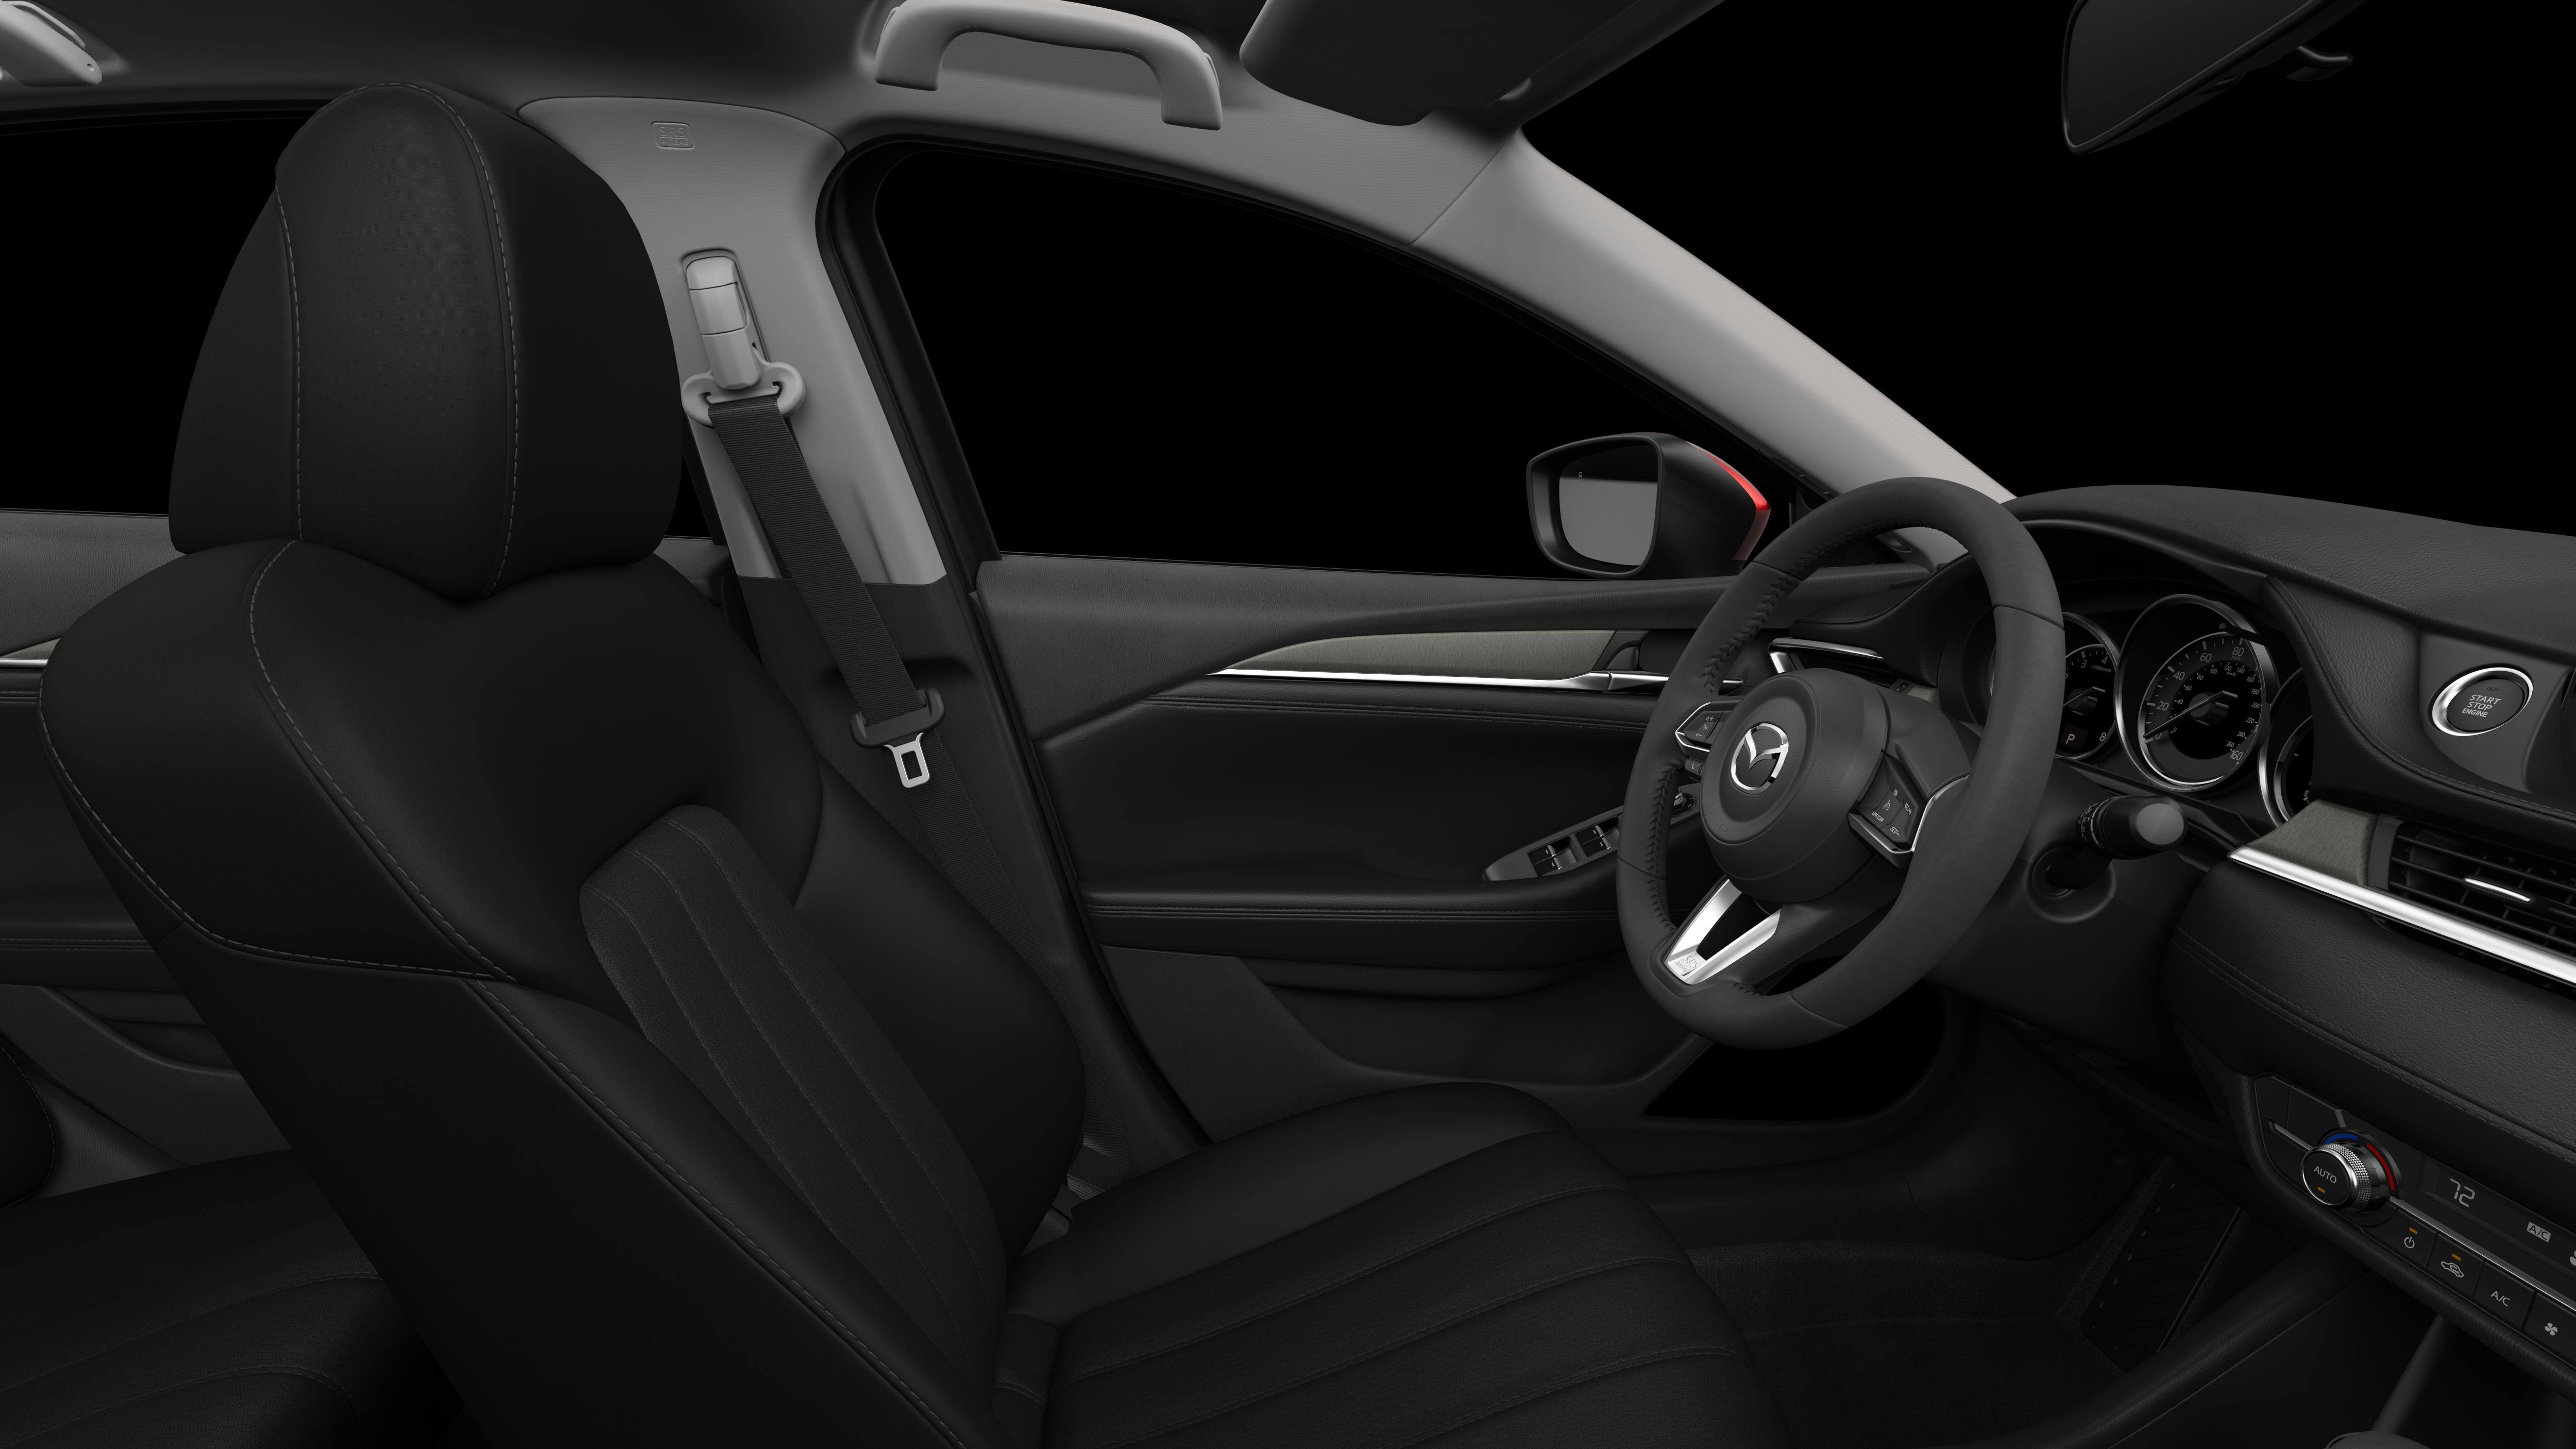 2018 Mazda6, Black Cloth